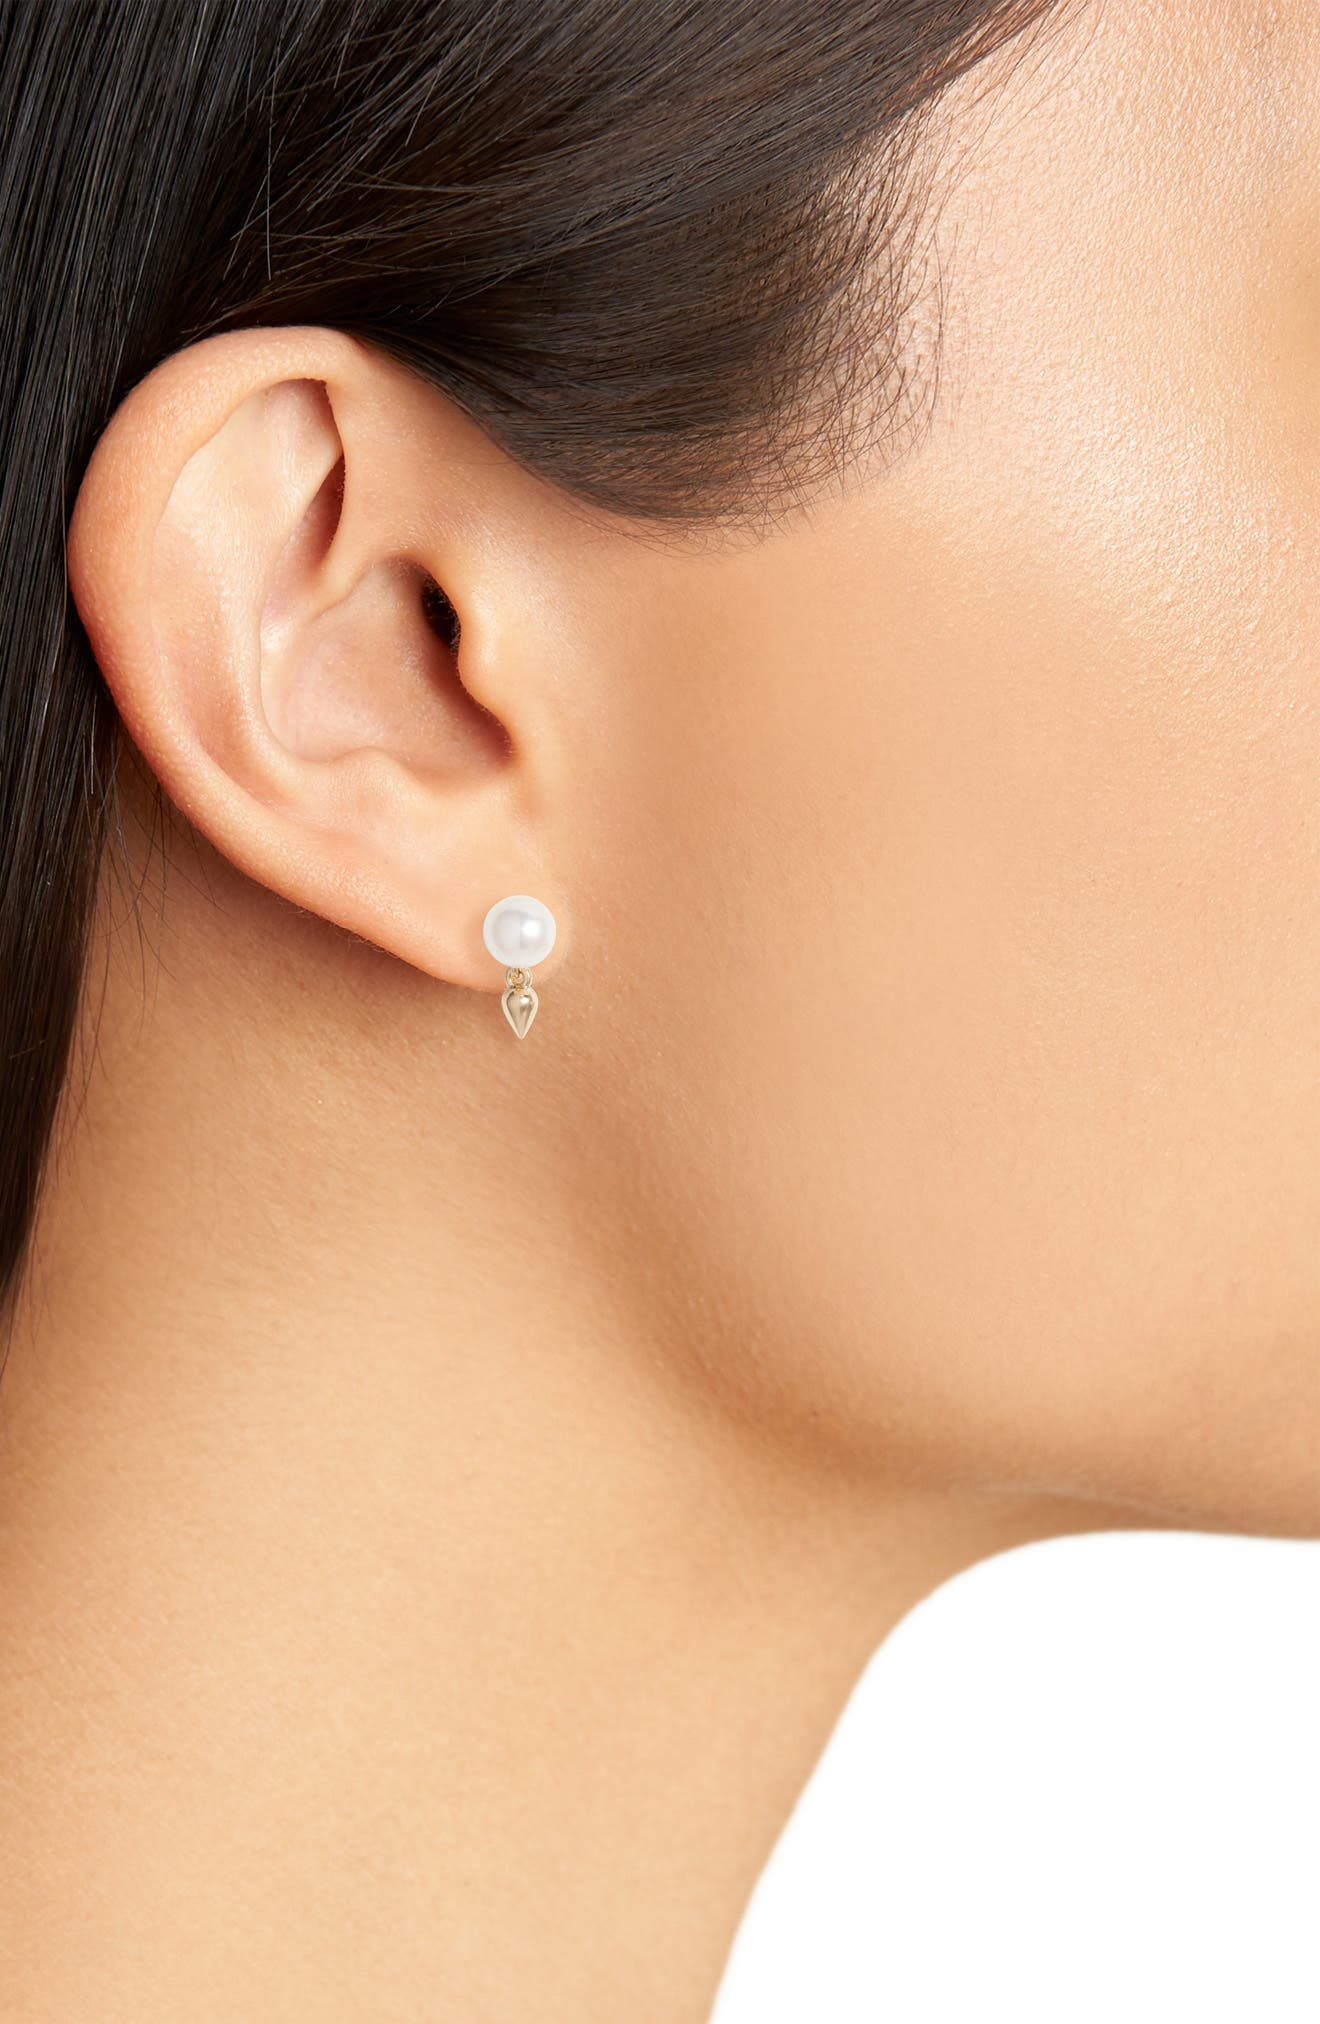 Pearl Stud Earrings,                             Alternate thumbnail 2, color,                             YELLOW GOLD